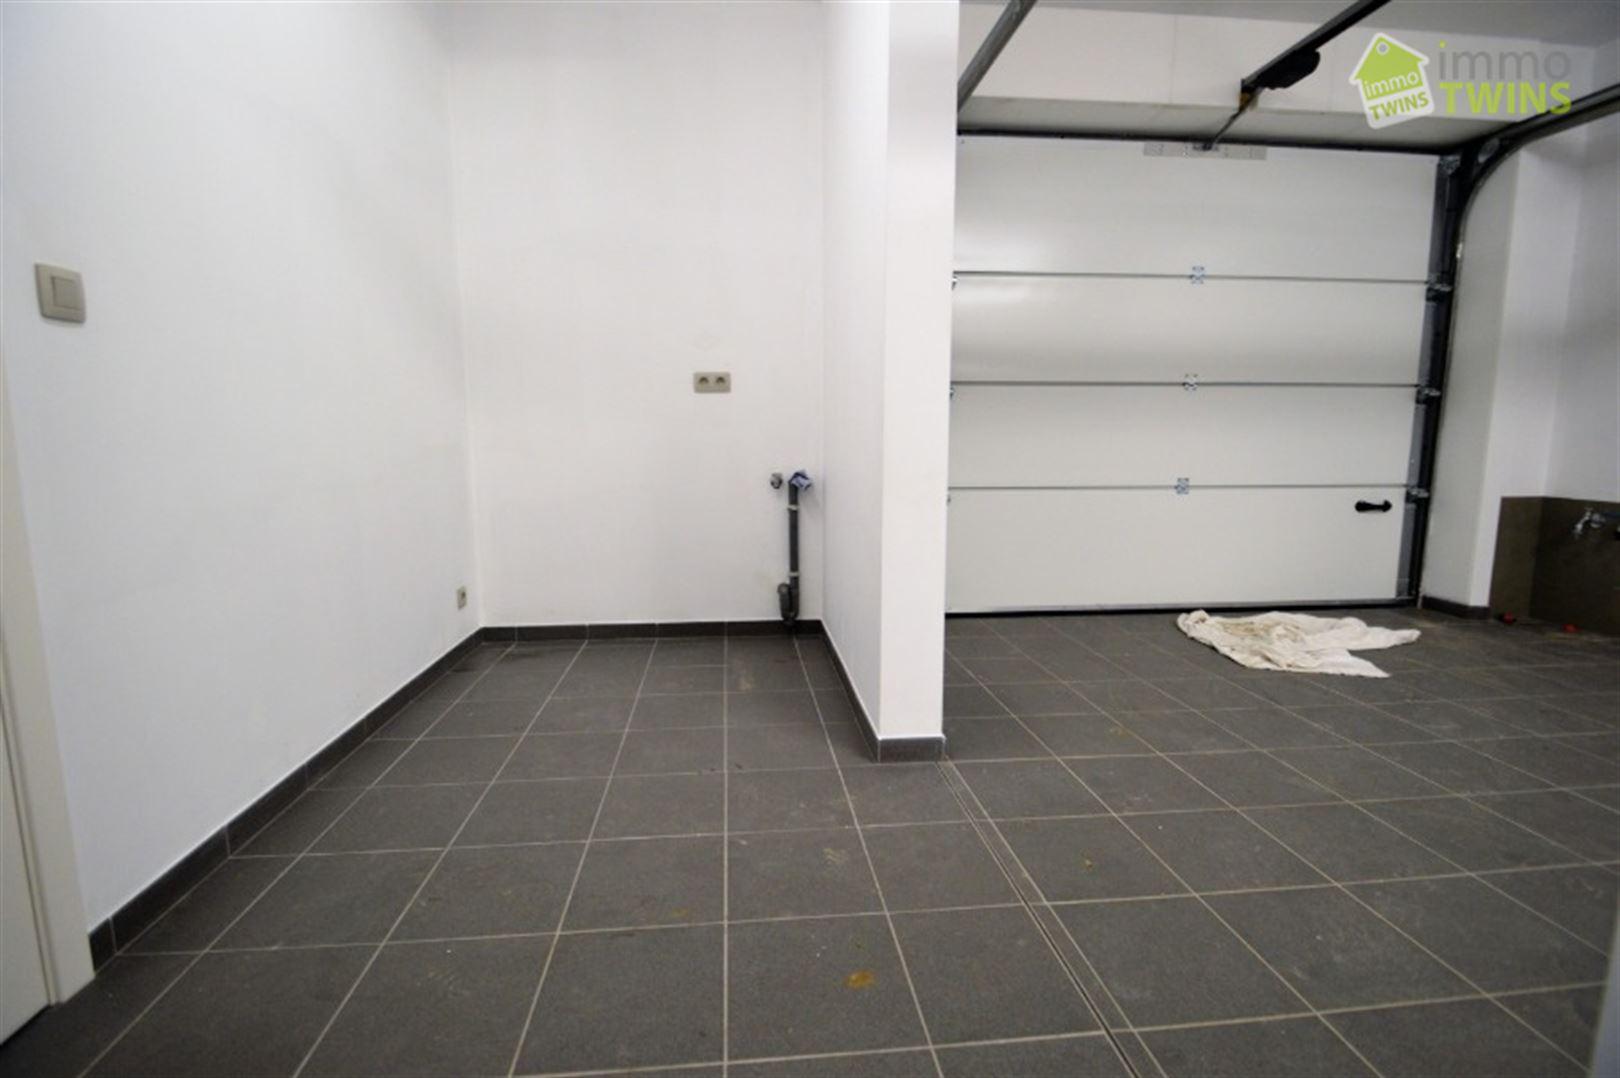 Foto 15 : Woning te 9200 Sint-Gillis-bij-Dendermonde (België) - Prijs € 999